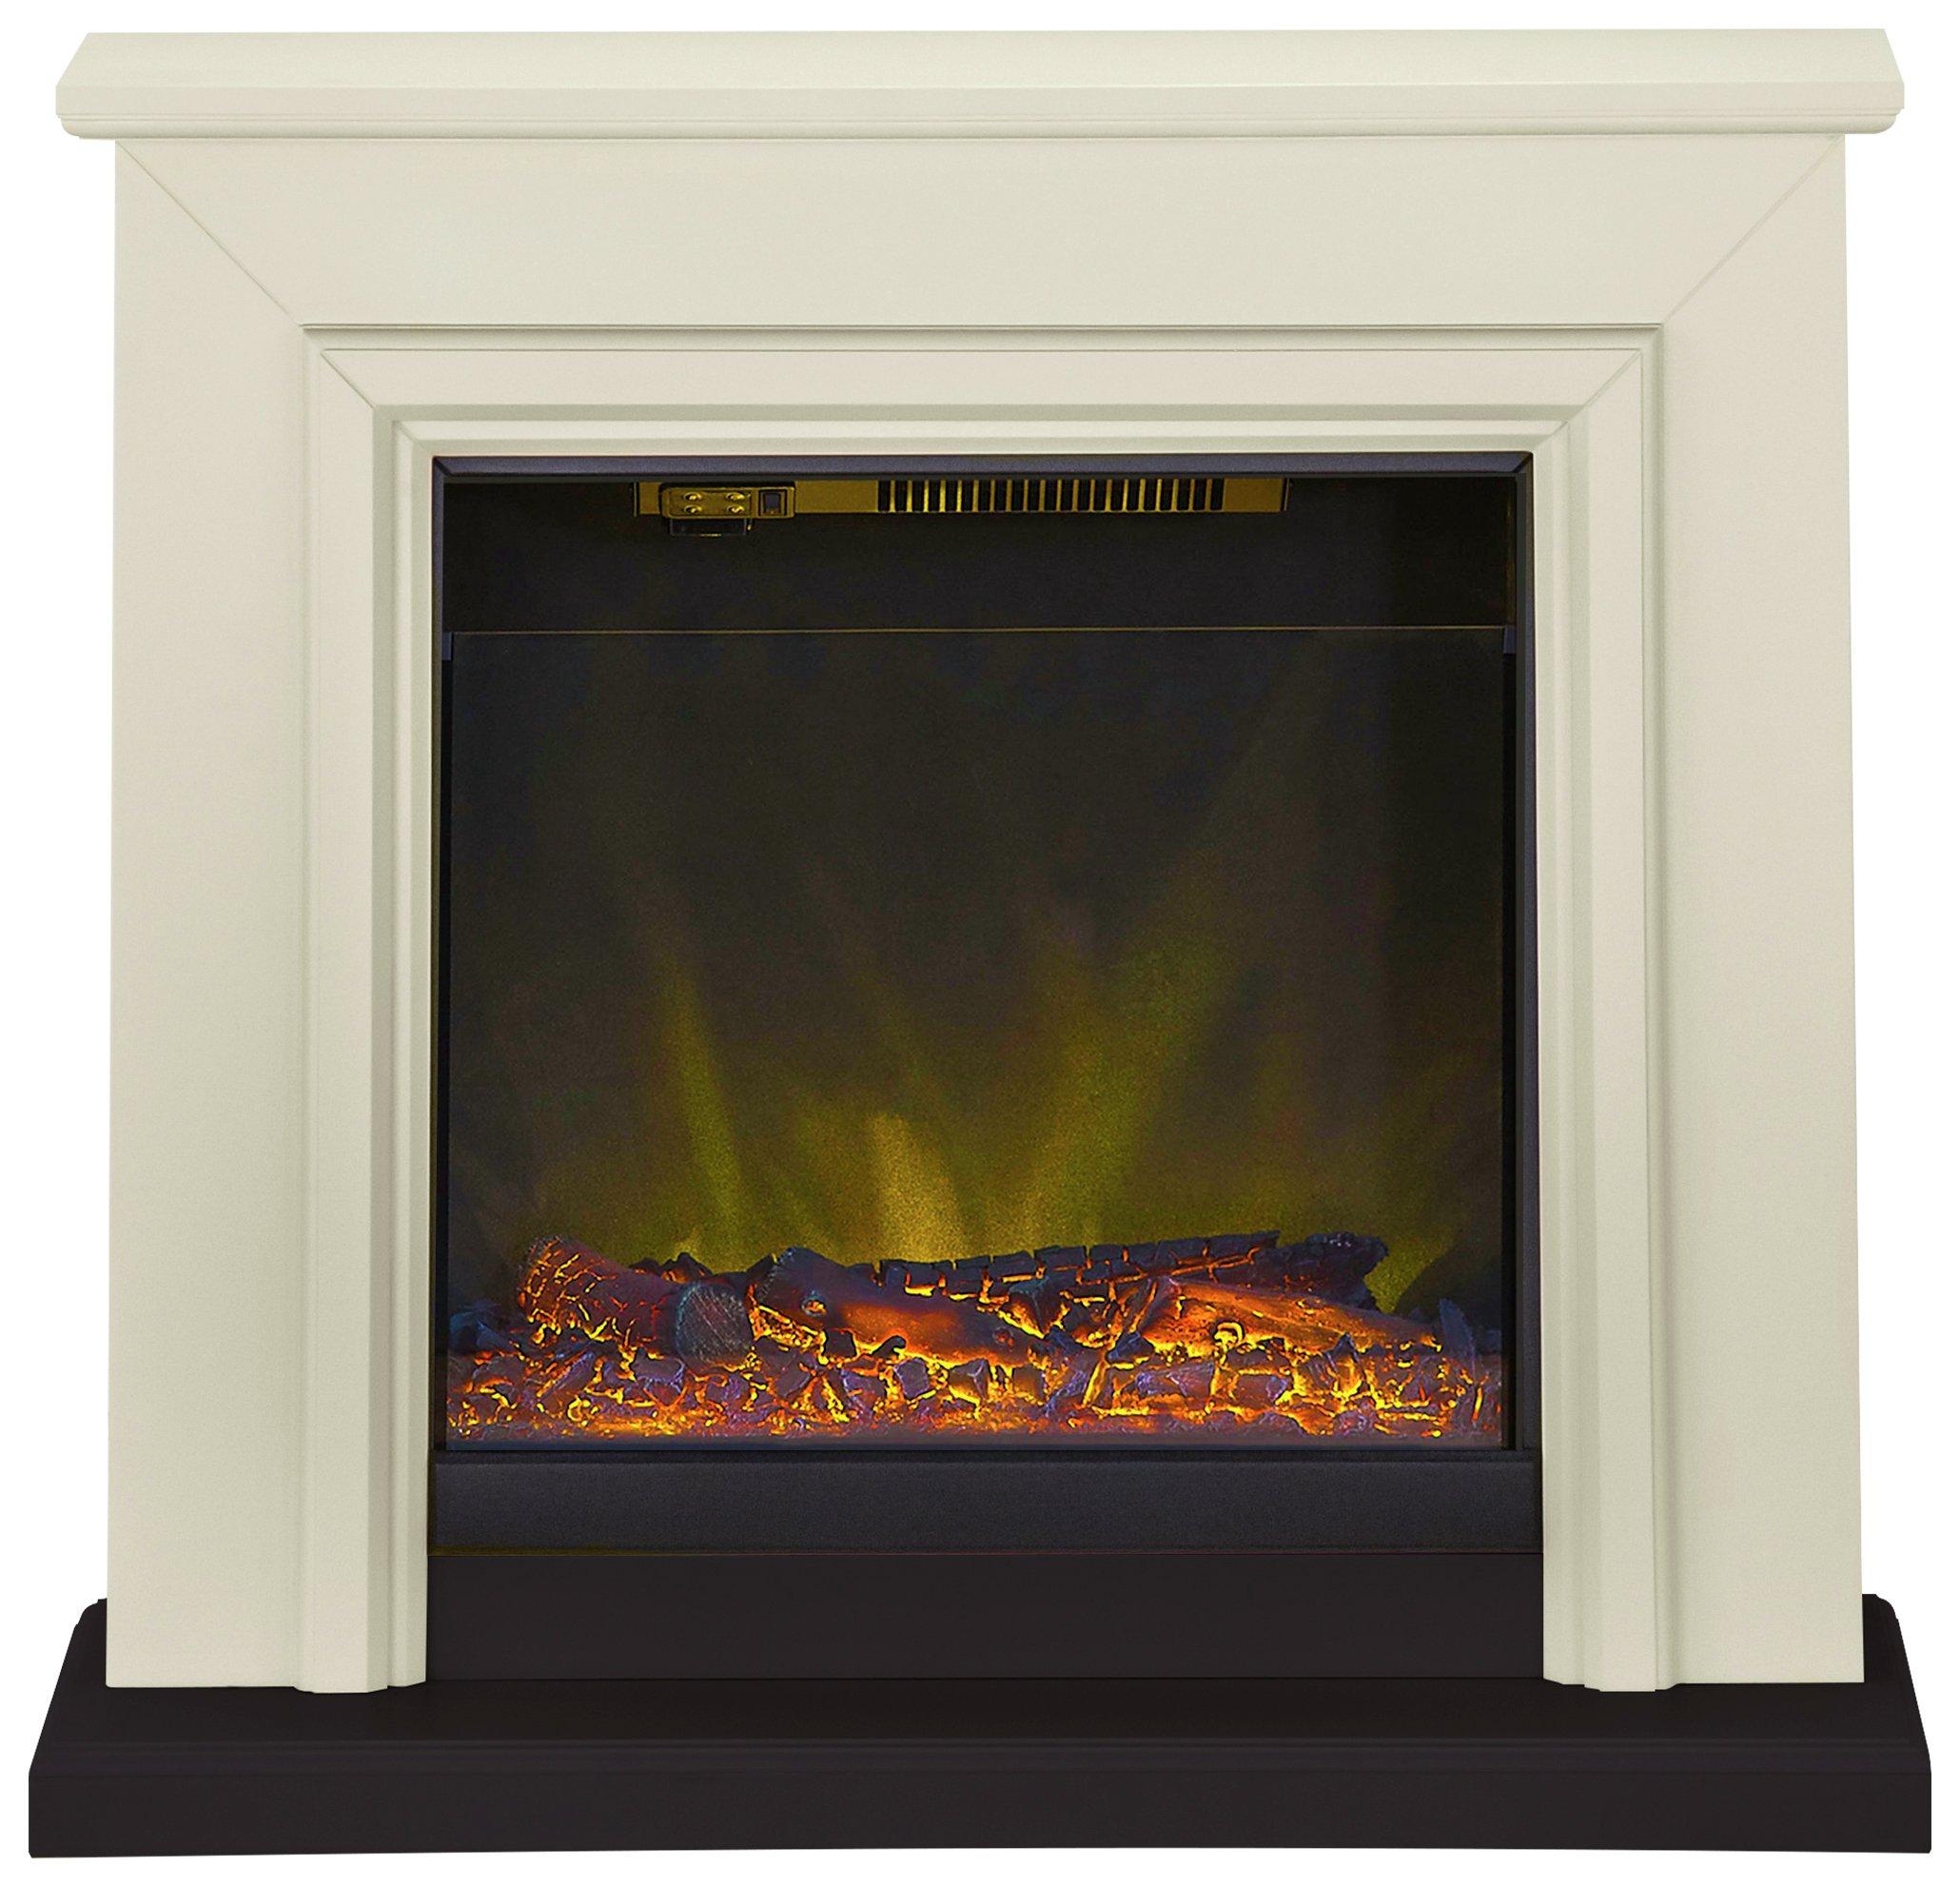 Adam Kensington 2kw Electric Fireplace Suite Stone Black